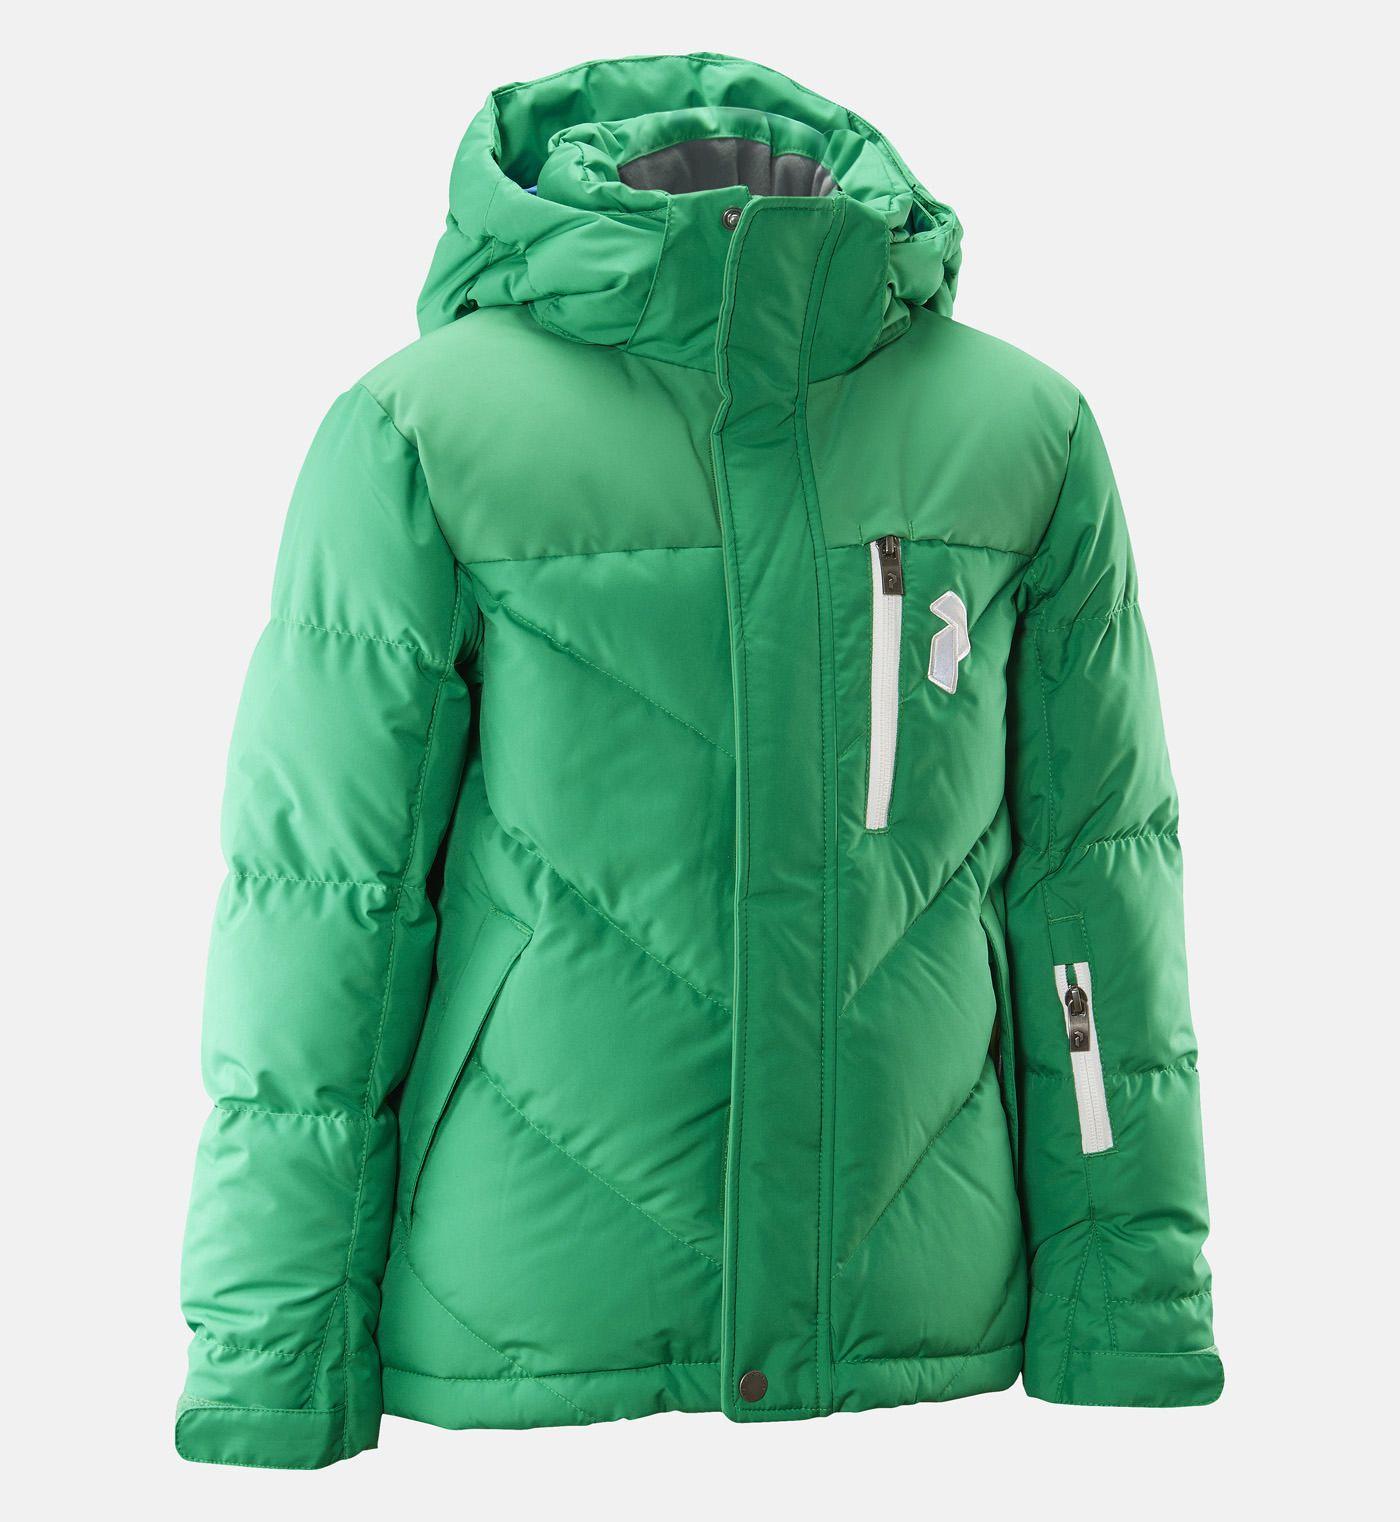 b256617f6 Junior s Ice Down Jacket - jackets - Peak Performance